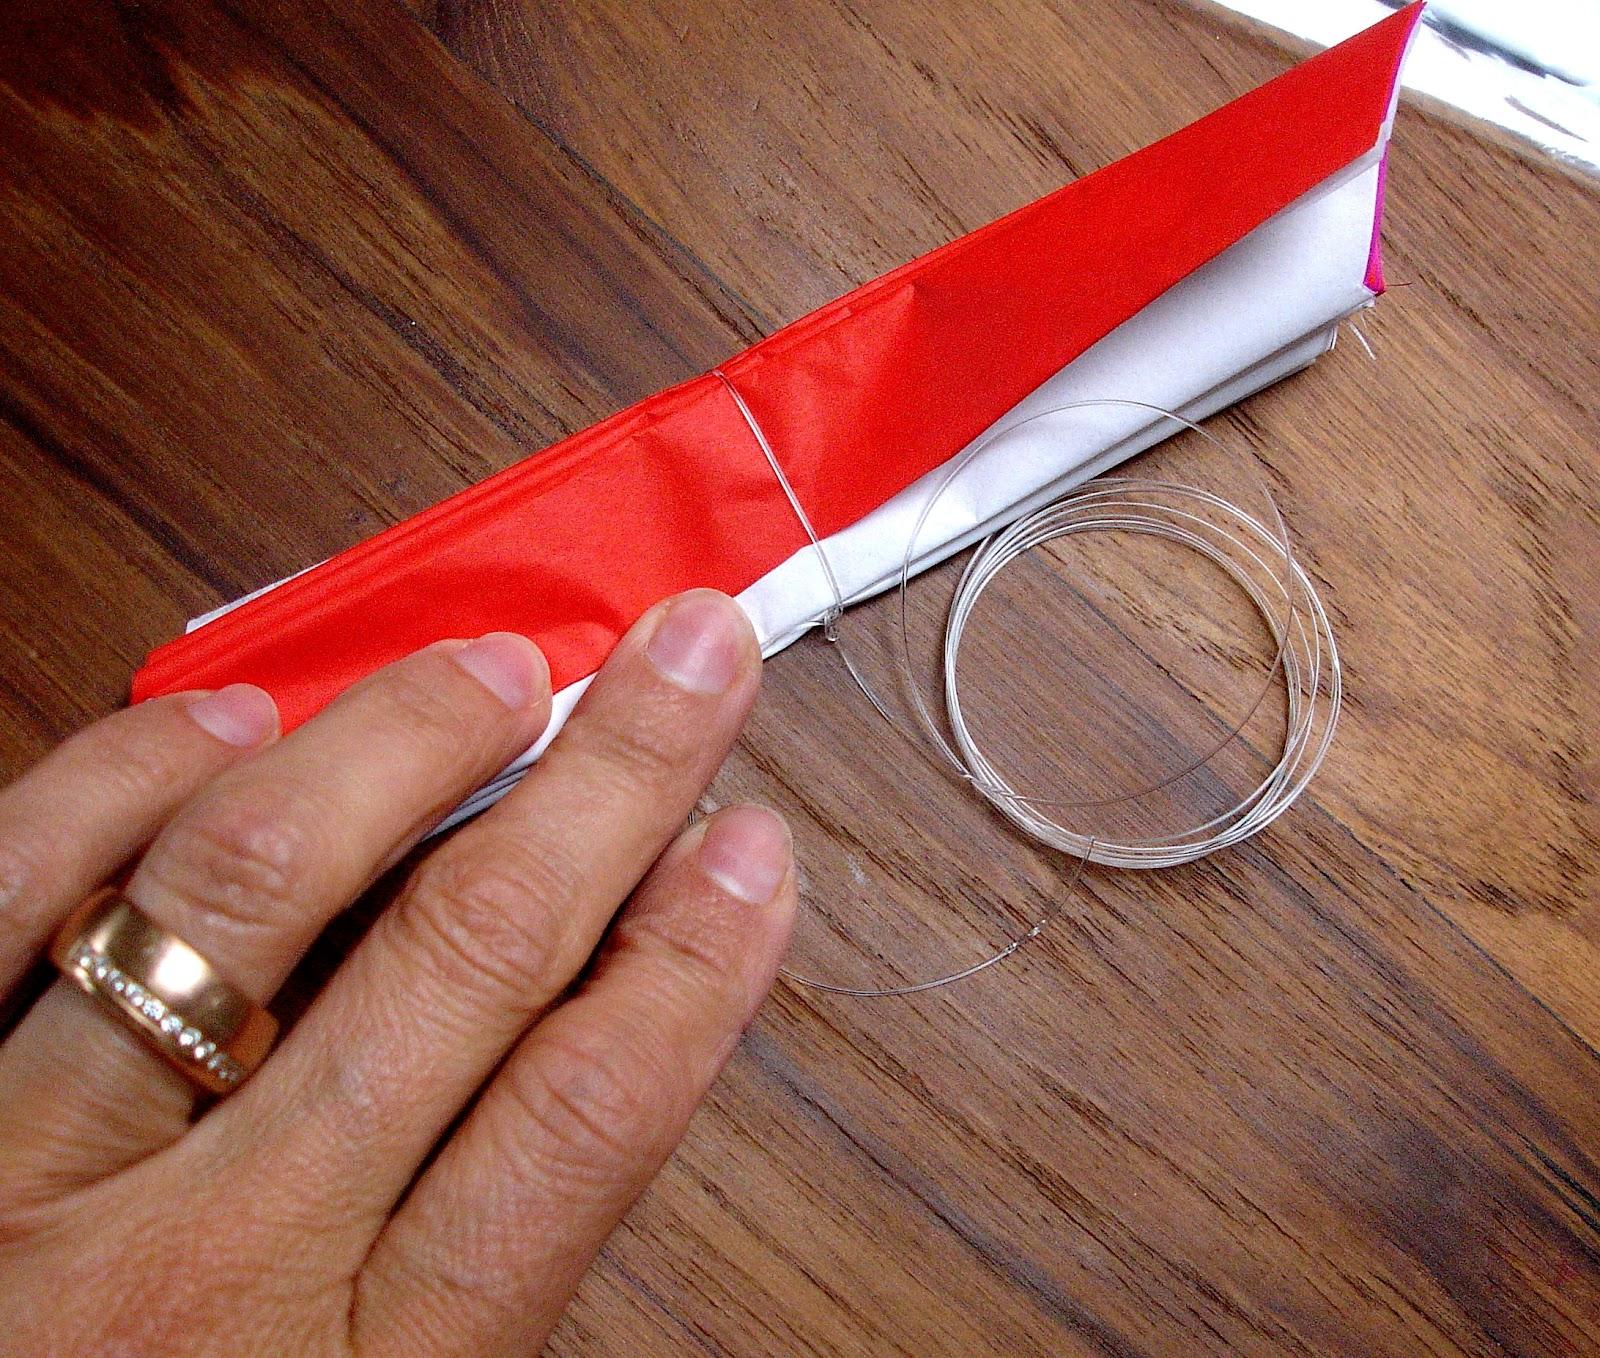 pompons aus seidenpapier nicole 39 s werkstatt. Black Bedroom Furniture Sets. Home Design Ideas